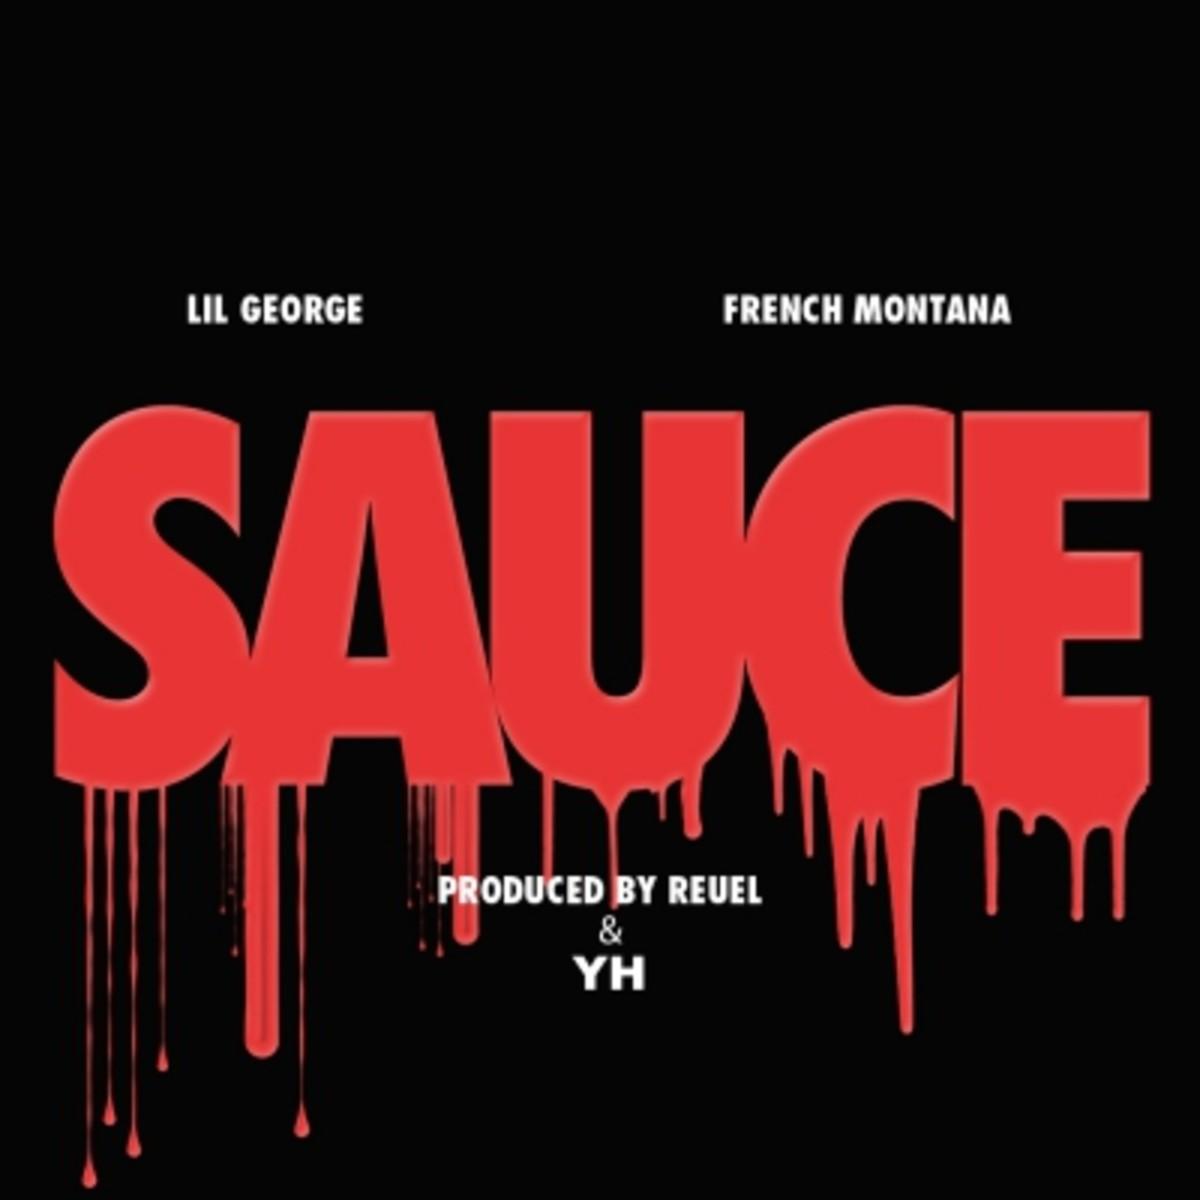 lil-george-sauce-remix.jpg